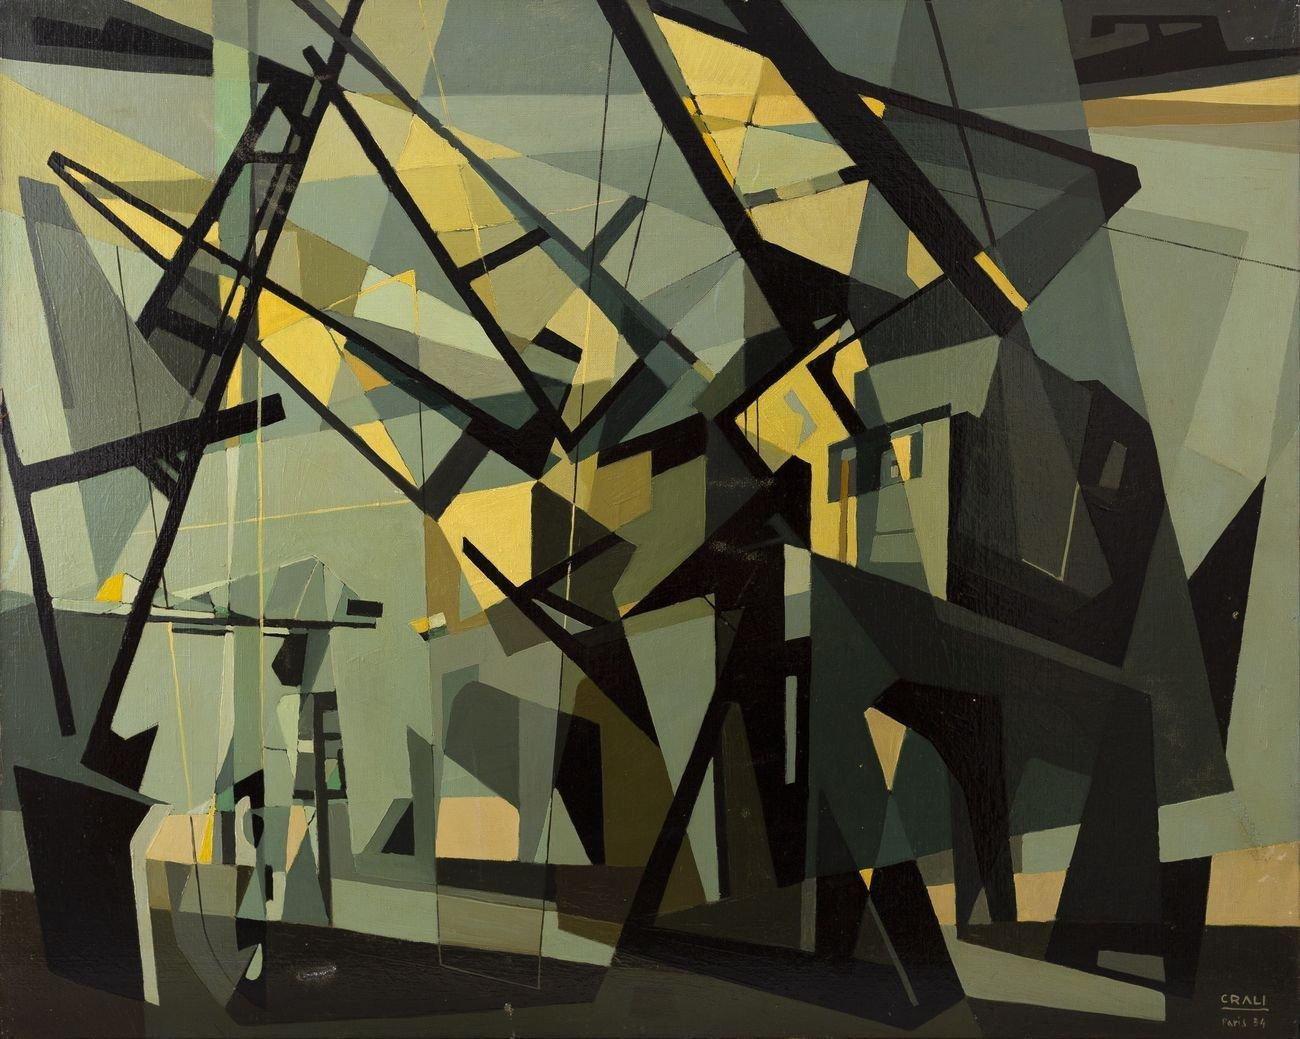 Tullio Crali, Structures portuaires (Nantes), 1954. Collezione privata